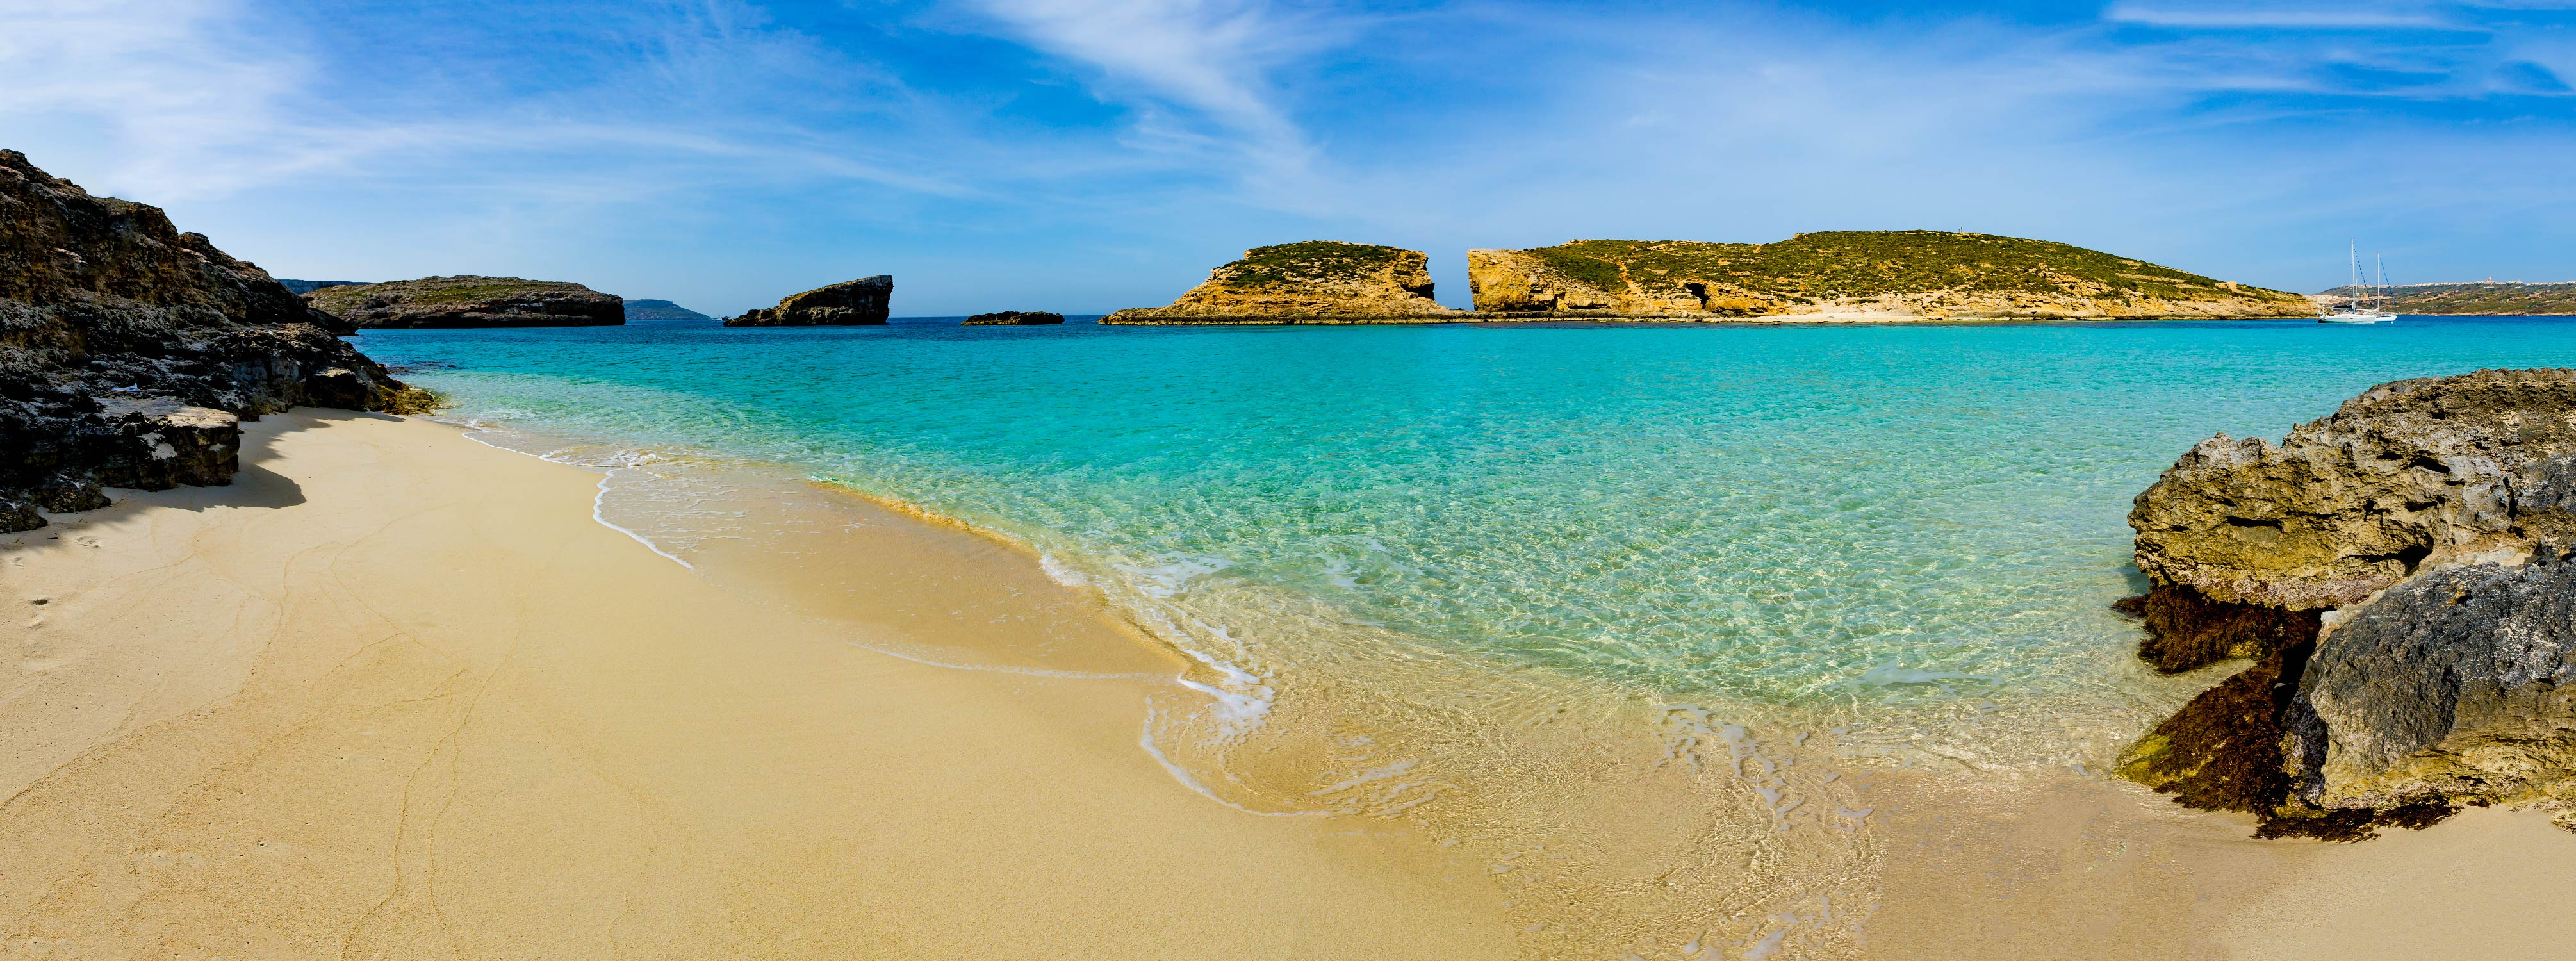 Audrey: My island hop in Malta